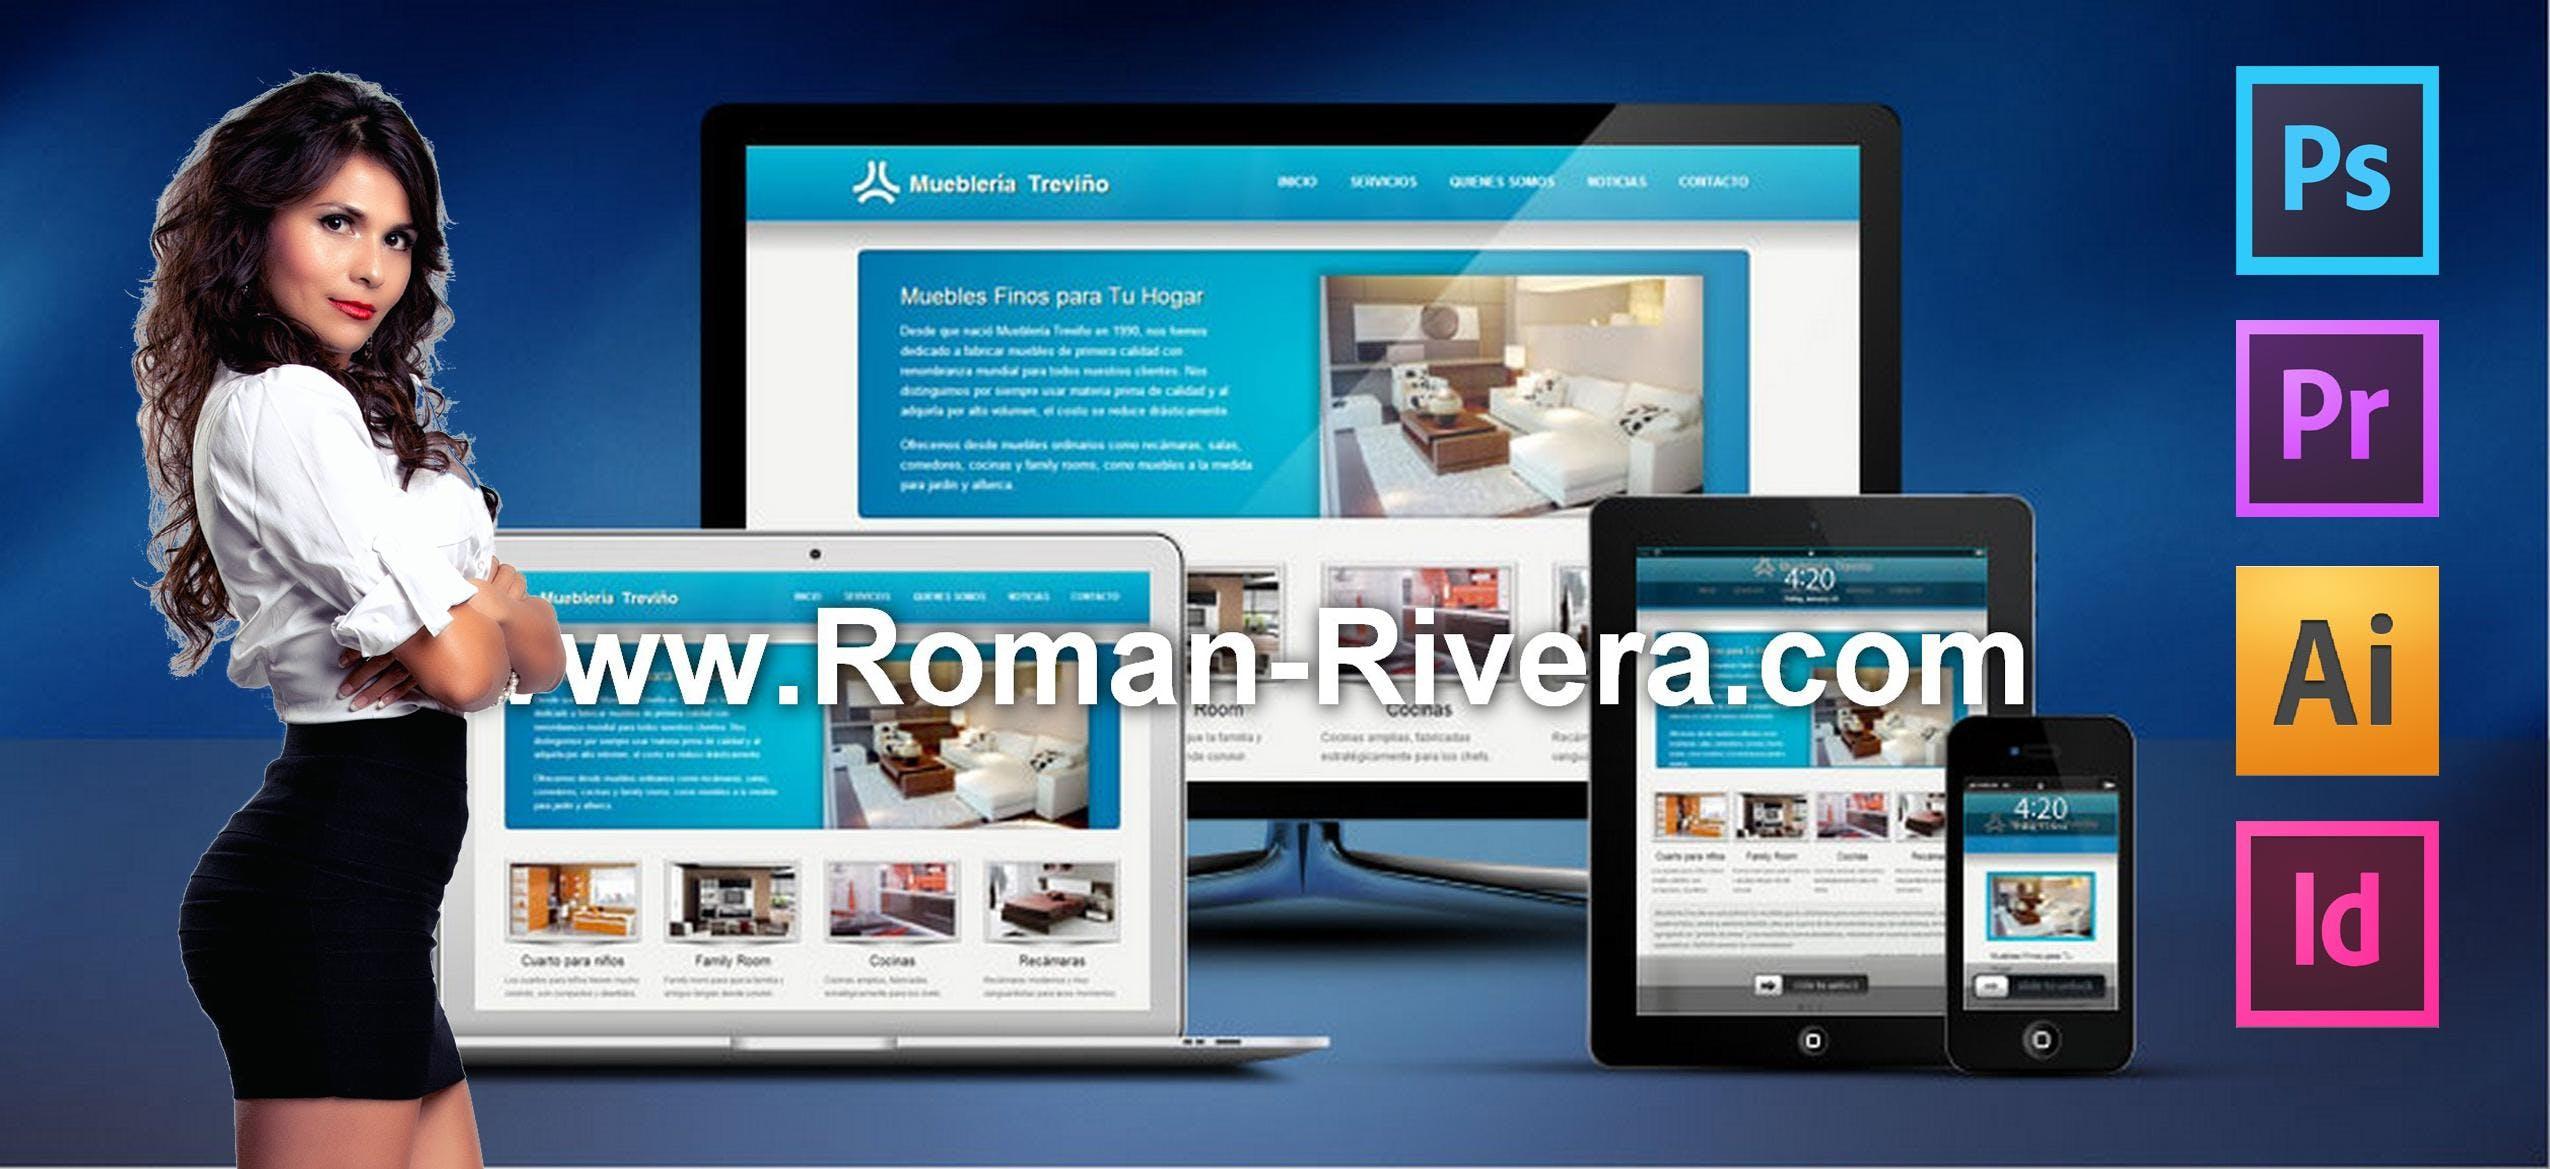 Website Design - Learn Coding with Adobe Drea